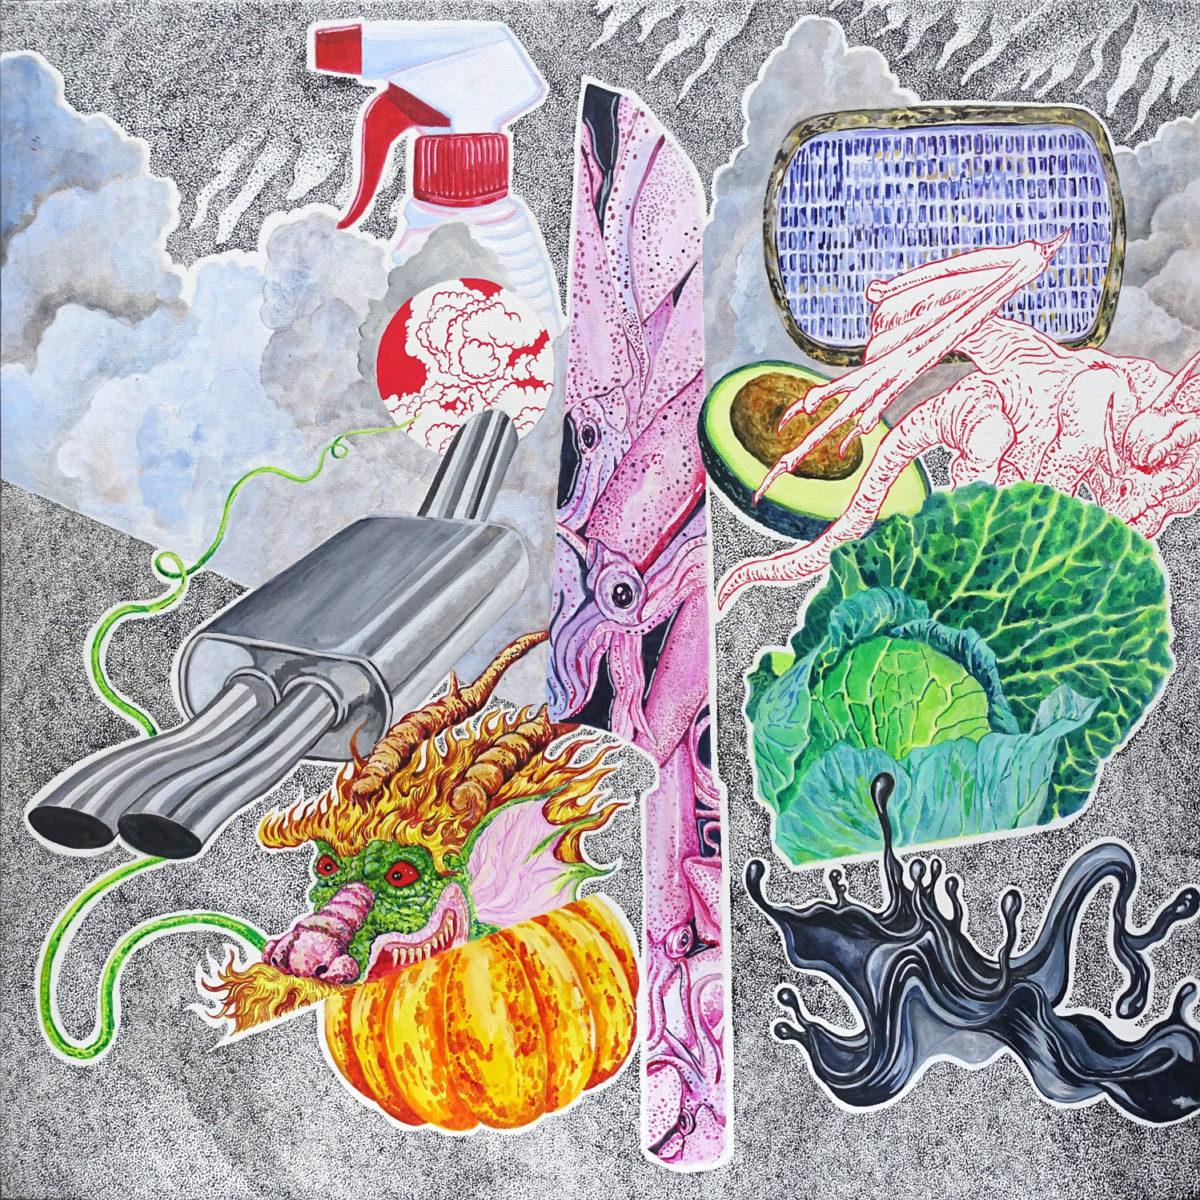 Hasanul-Isyraf-Idris-Wing-Condensor-2019-Acrylic-on-canvas-61-x-61cm